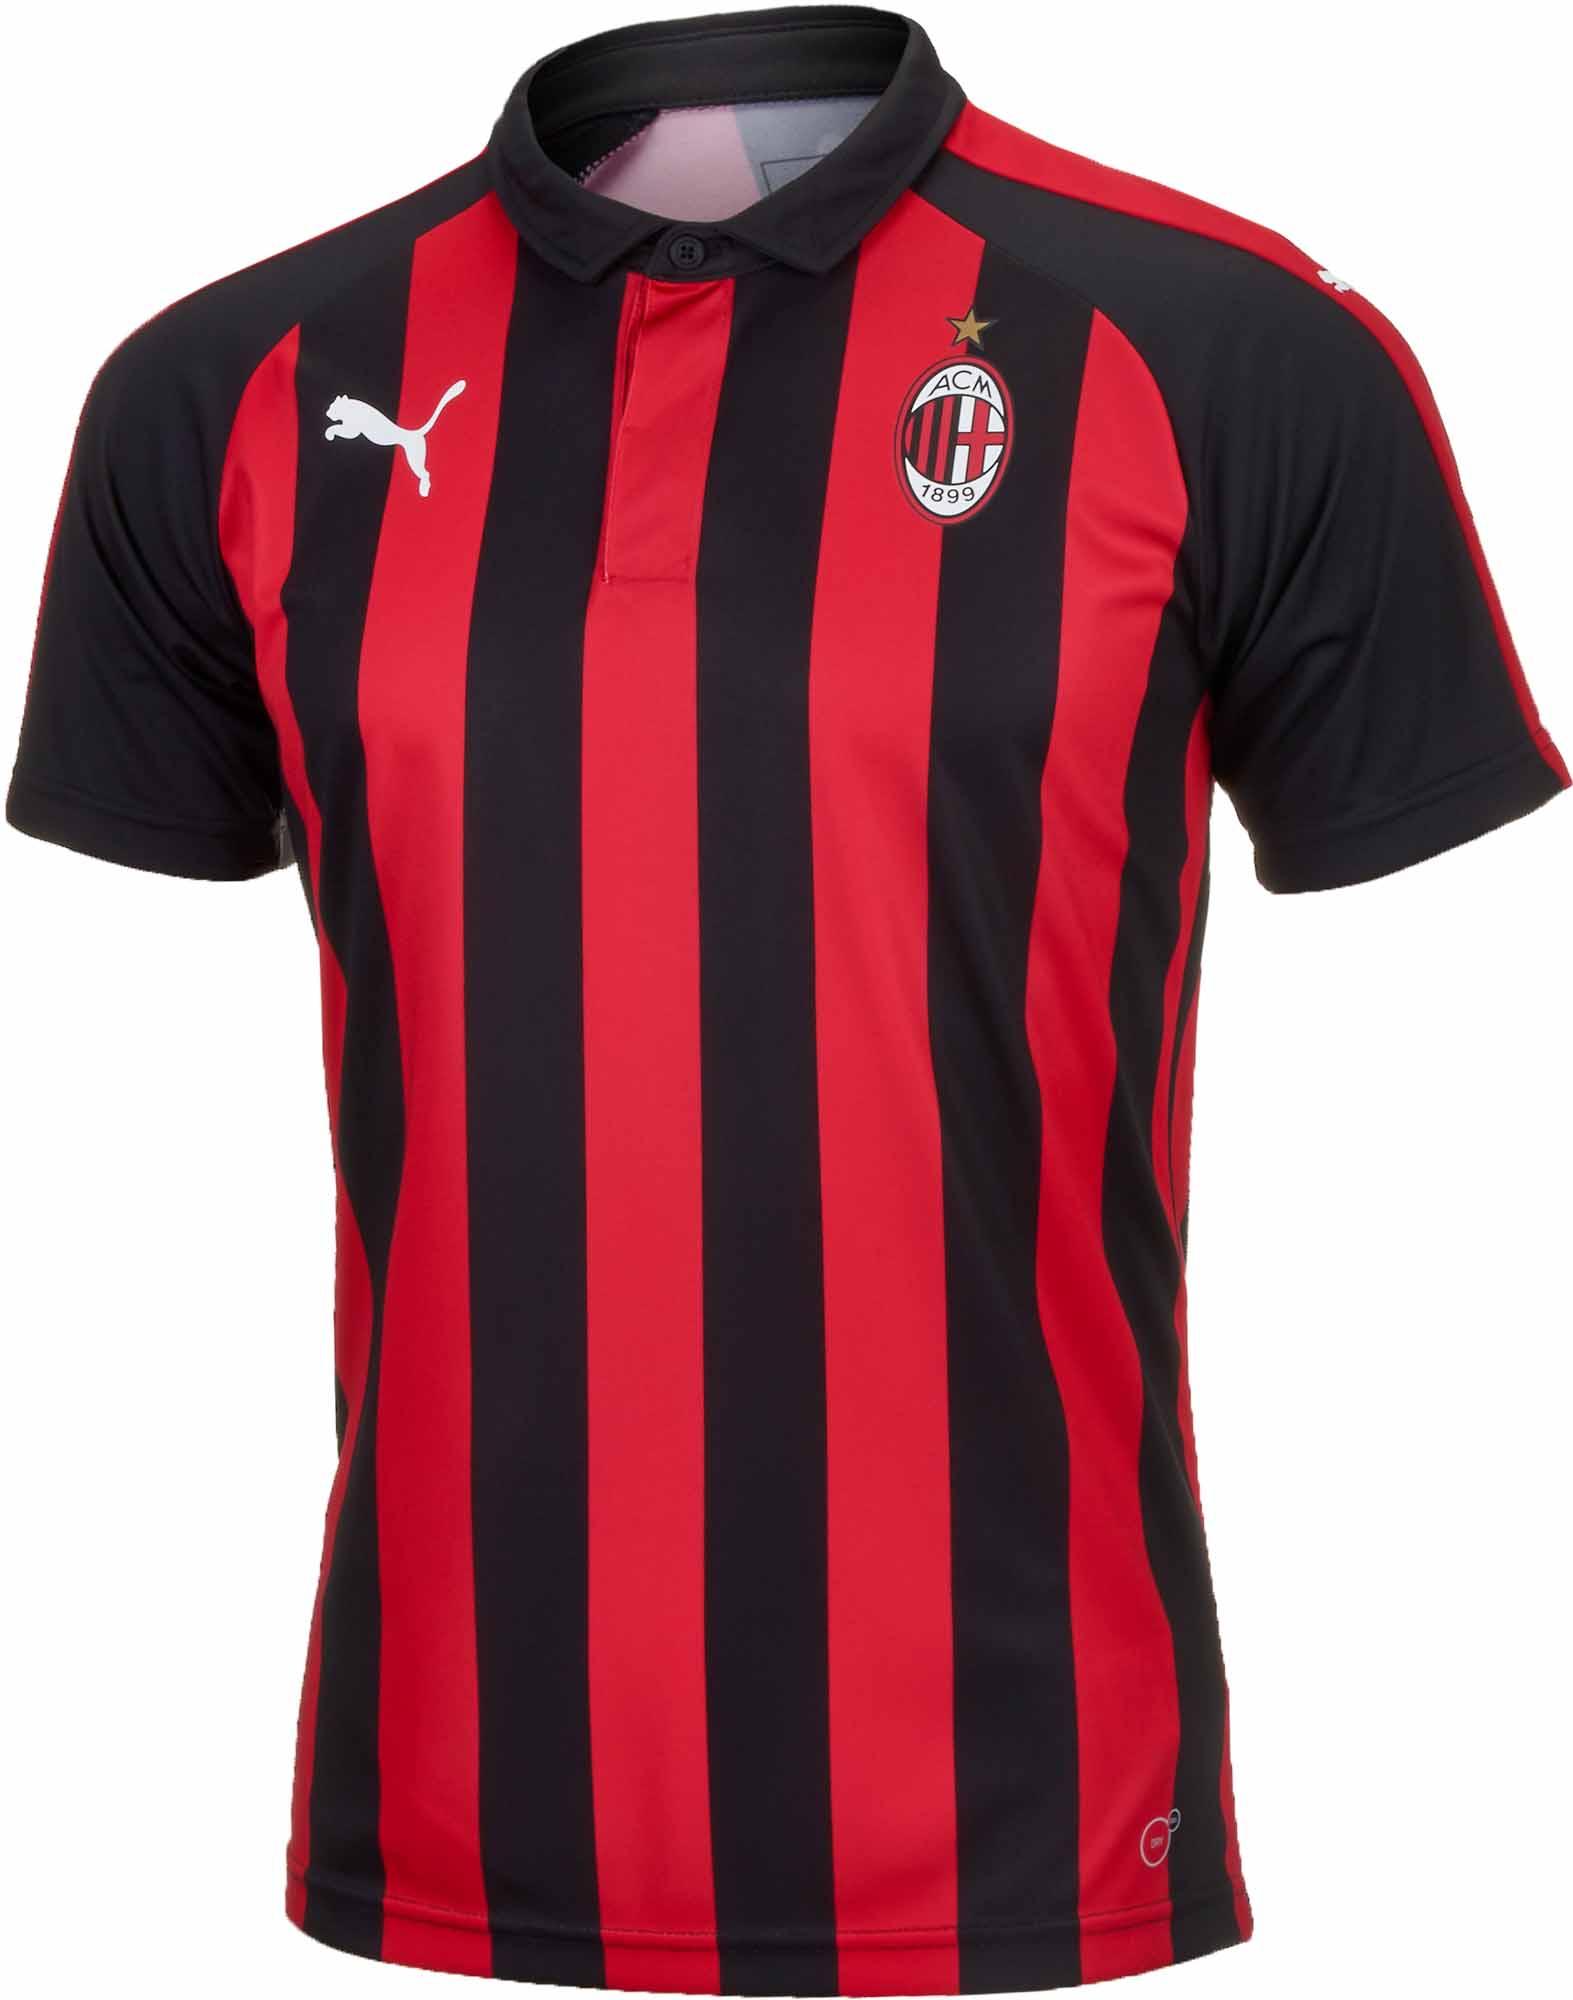 ba0e2b629 PUMA AC Milan Home Jersey - Special Edition 2018-19 - SoccerPro